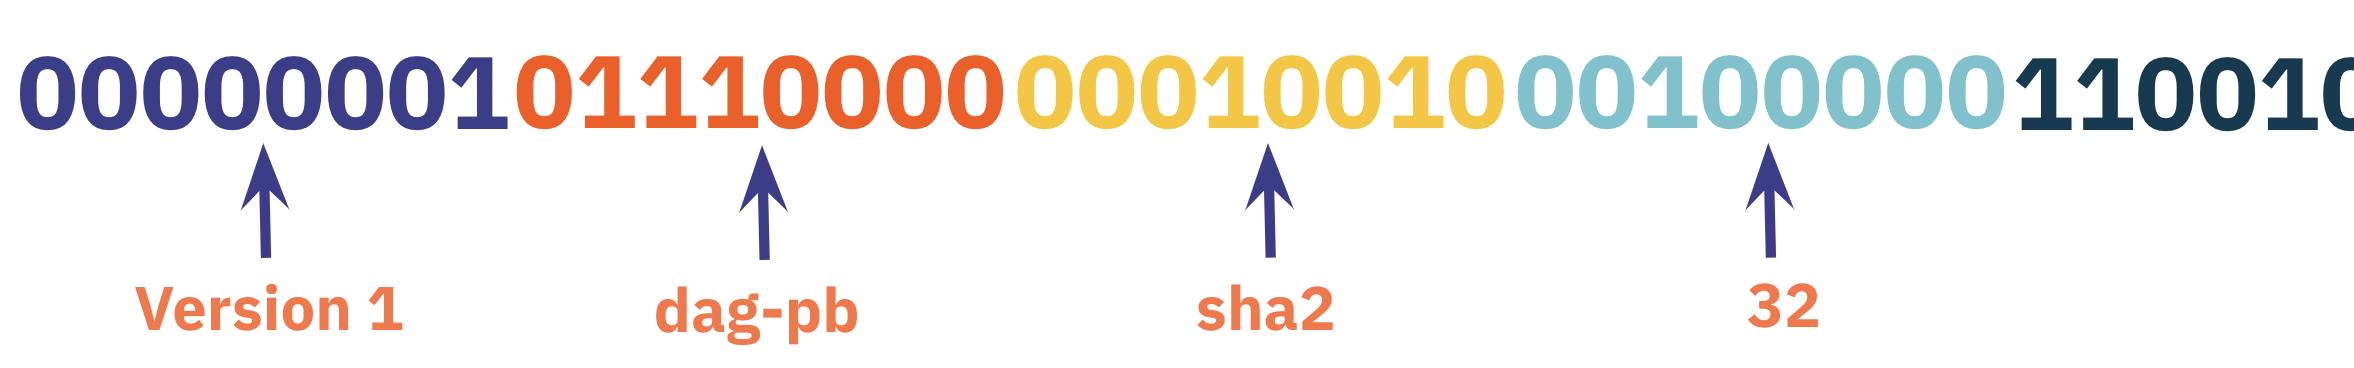 Version Prefix